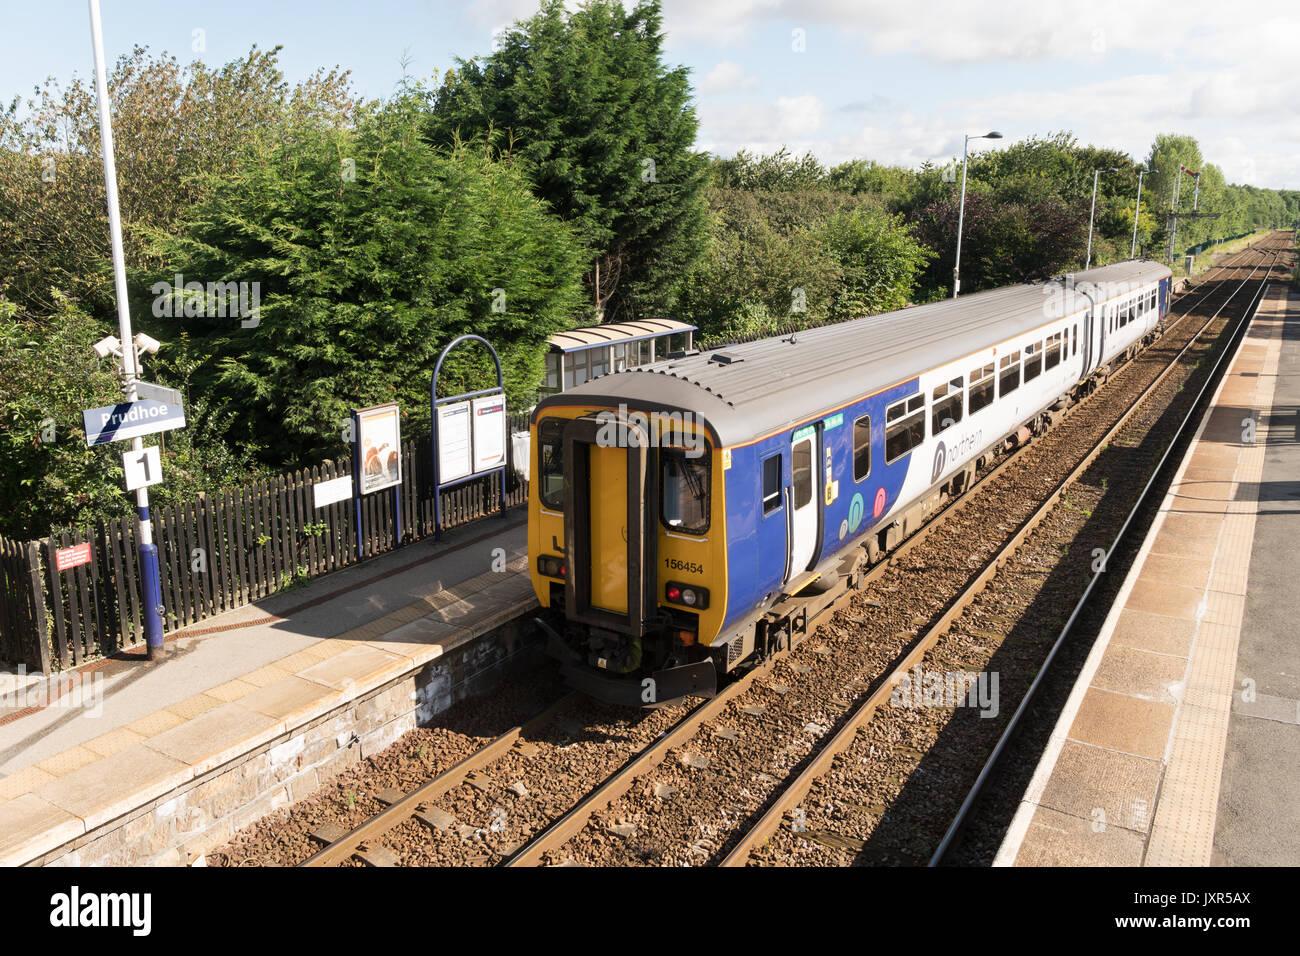 Arriva Rail North (Northern) sprinter diesel train in Prudhoe rail station, Northumberland, England - Stock Image